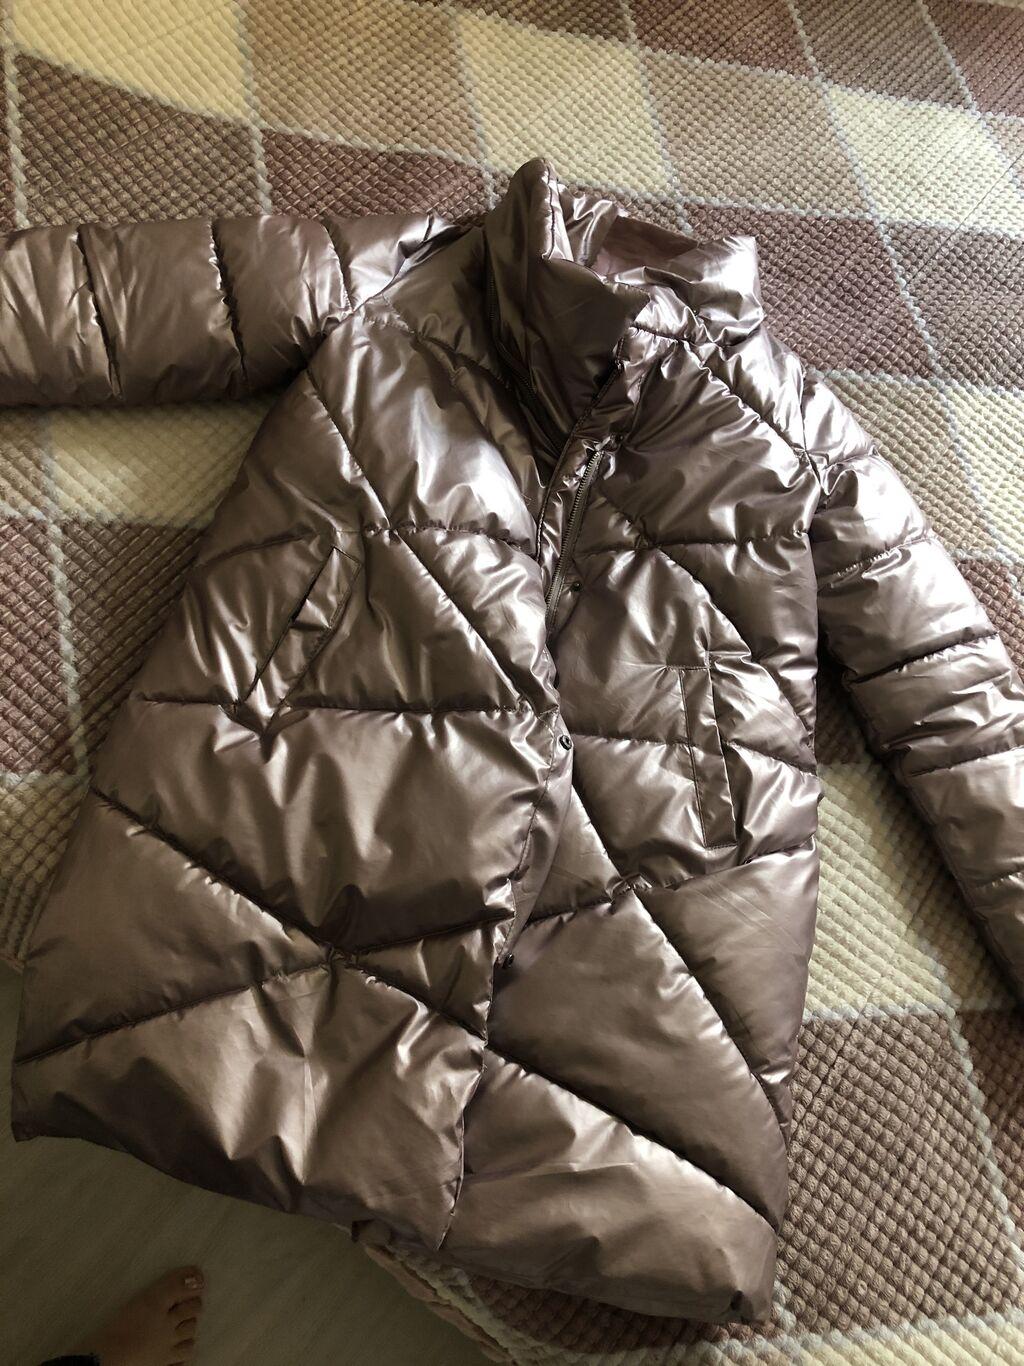 Продаю куртку размер М 999 сом: Продаю куртку размер М 999 сом